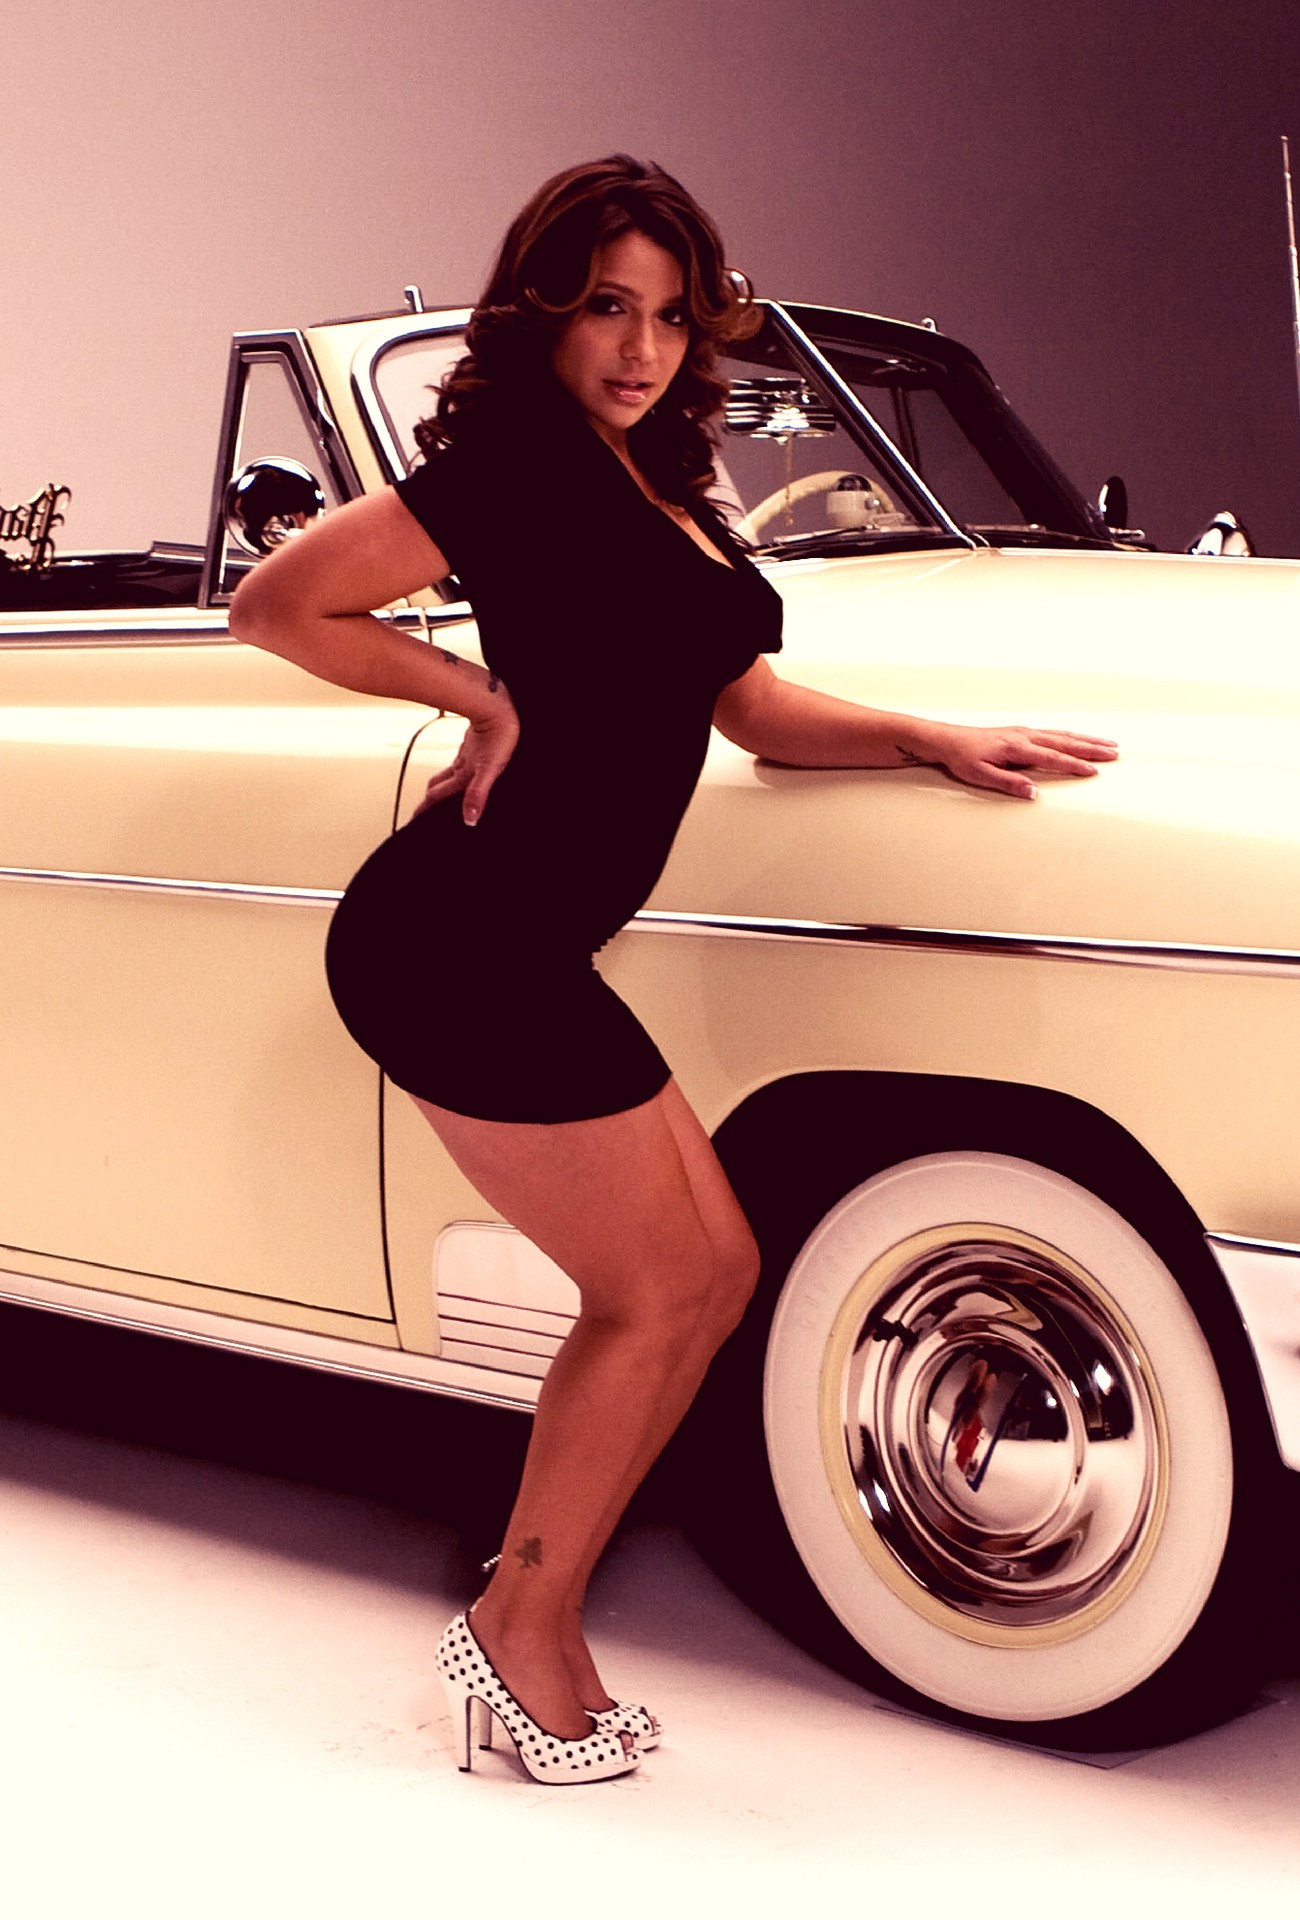 Vida Guerra - Low Rider Photo Shoot - Sexy Actress Pictures | Hot Actress Pictures - ActressSnaps.com